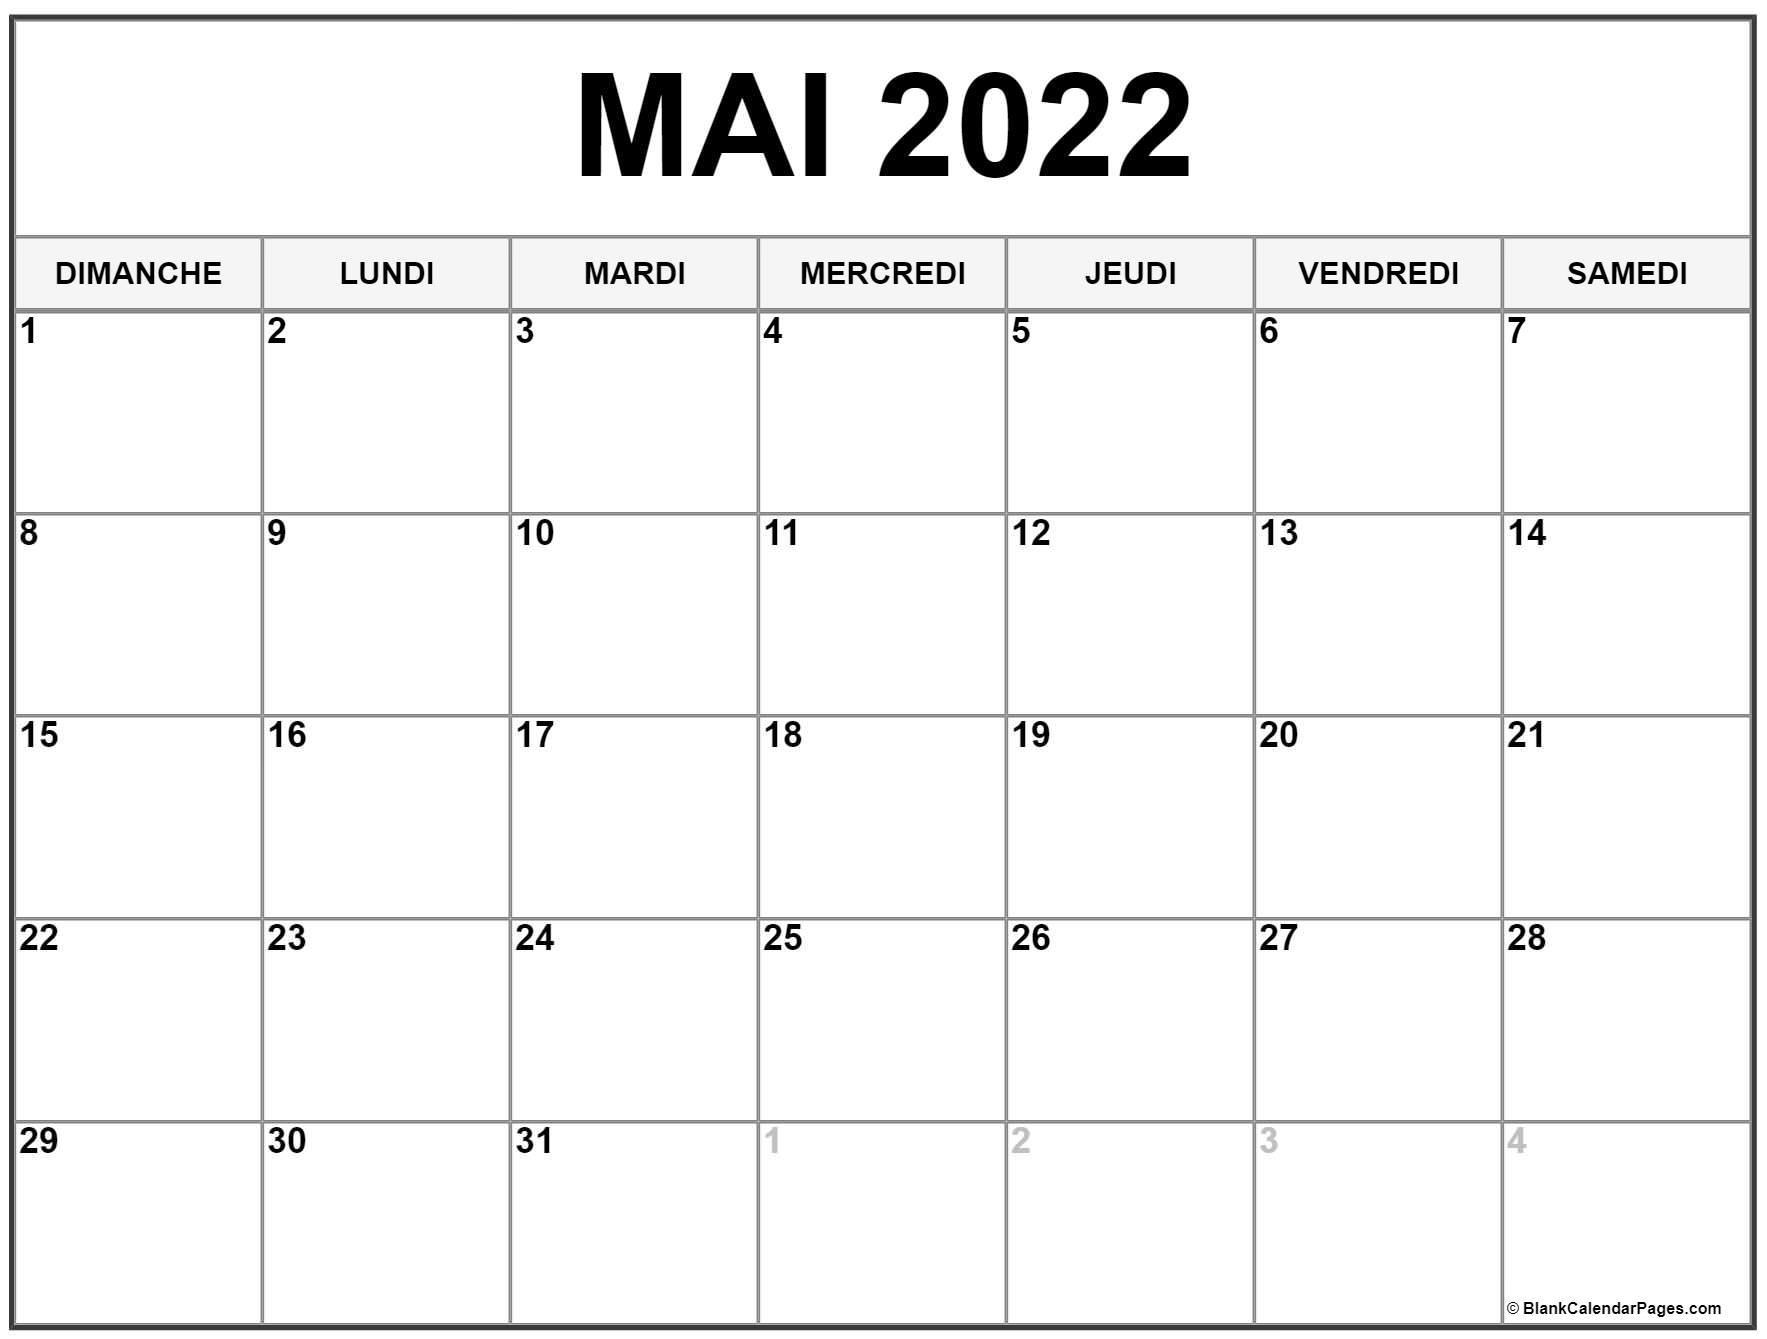 Calendrier 2022 Mois De Mai mai 2022 calendrier imprimable   Calendrier gratuit